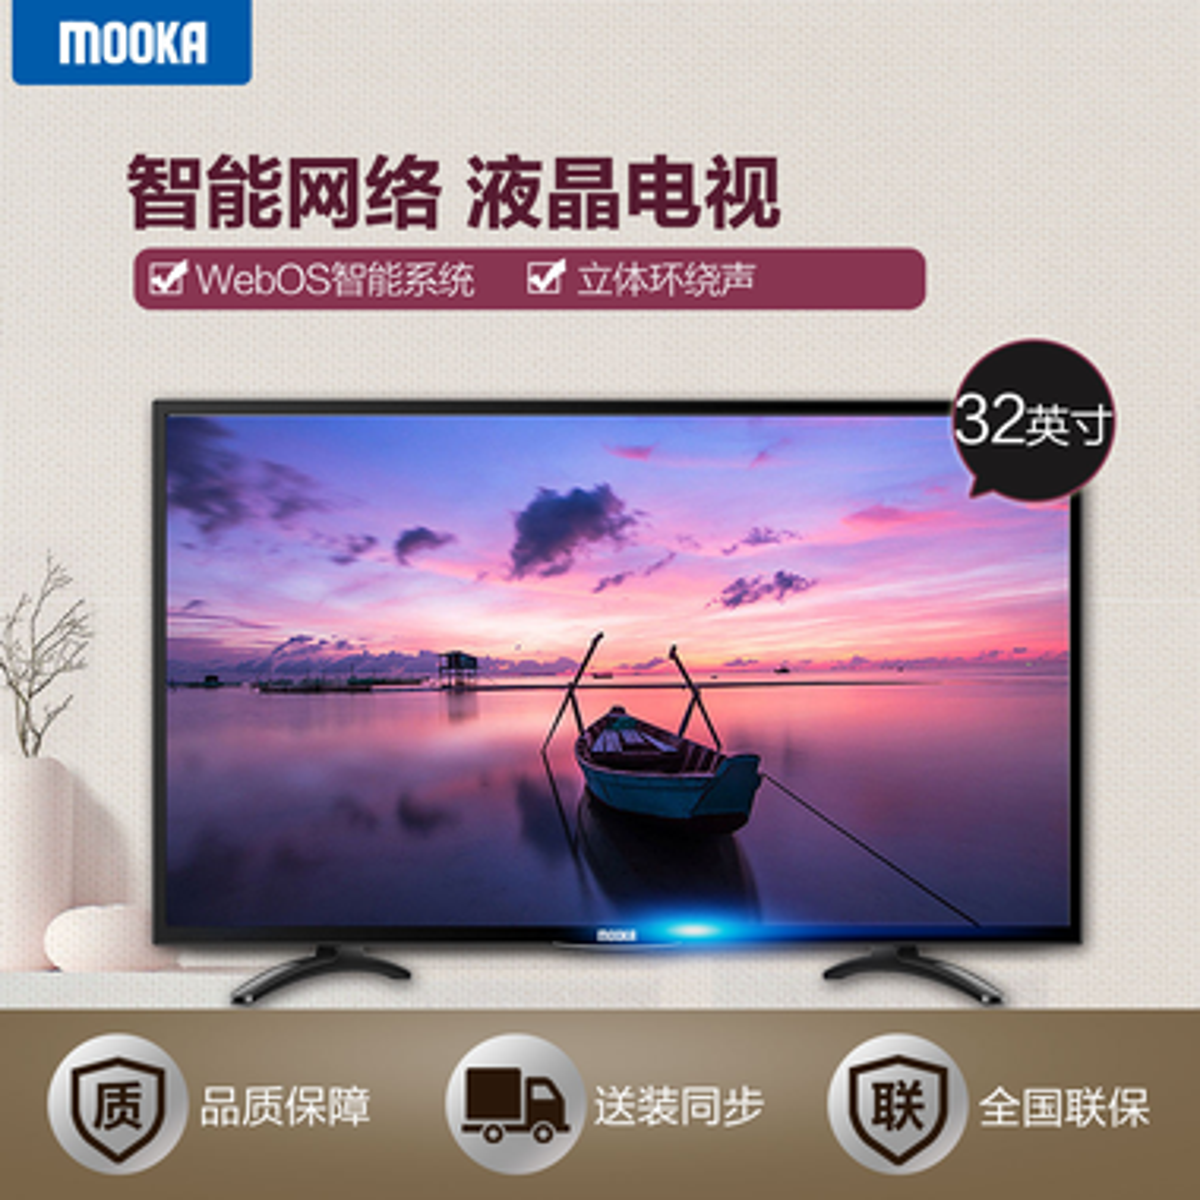 MOOKA/模卡 智能电视 32A6M